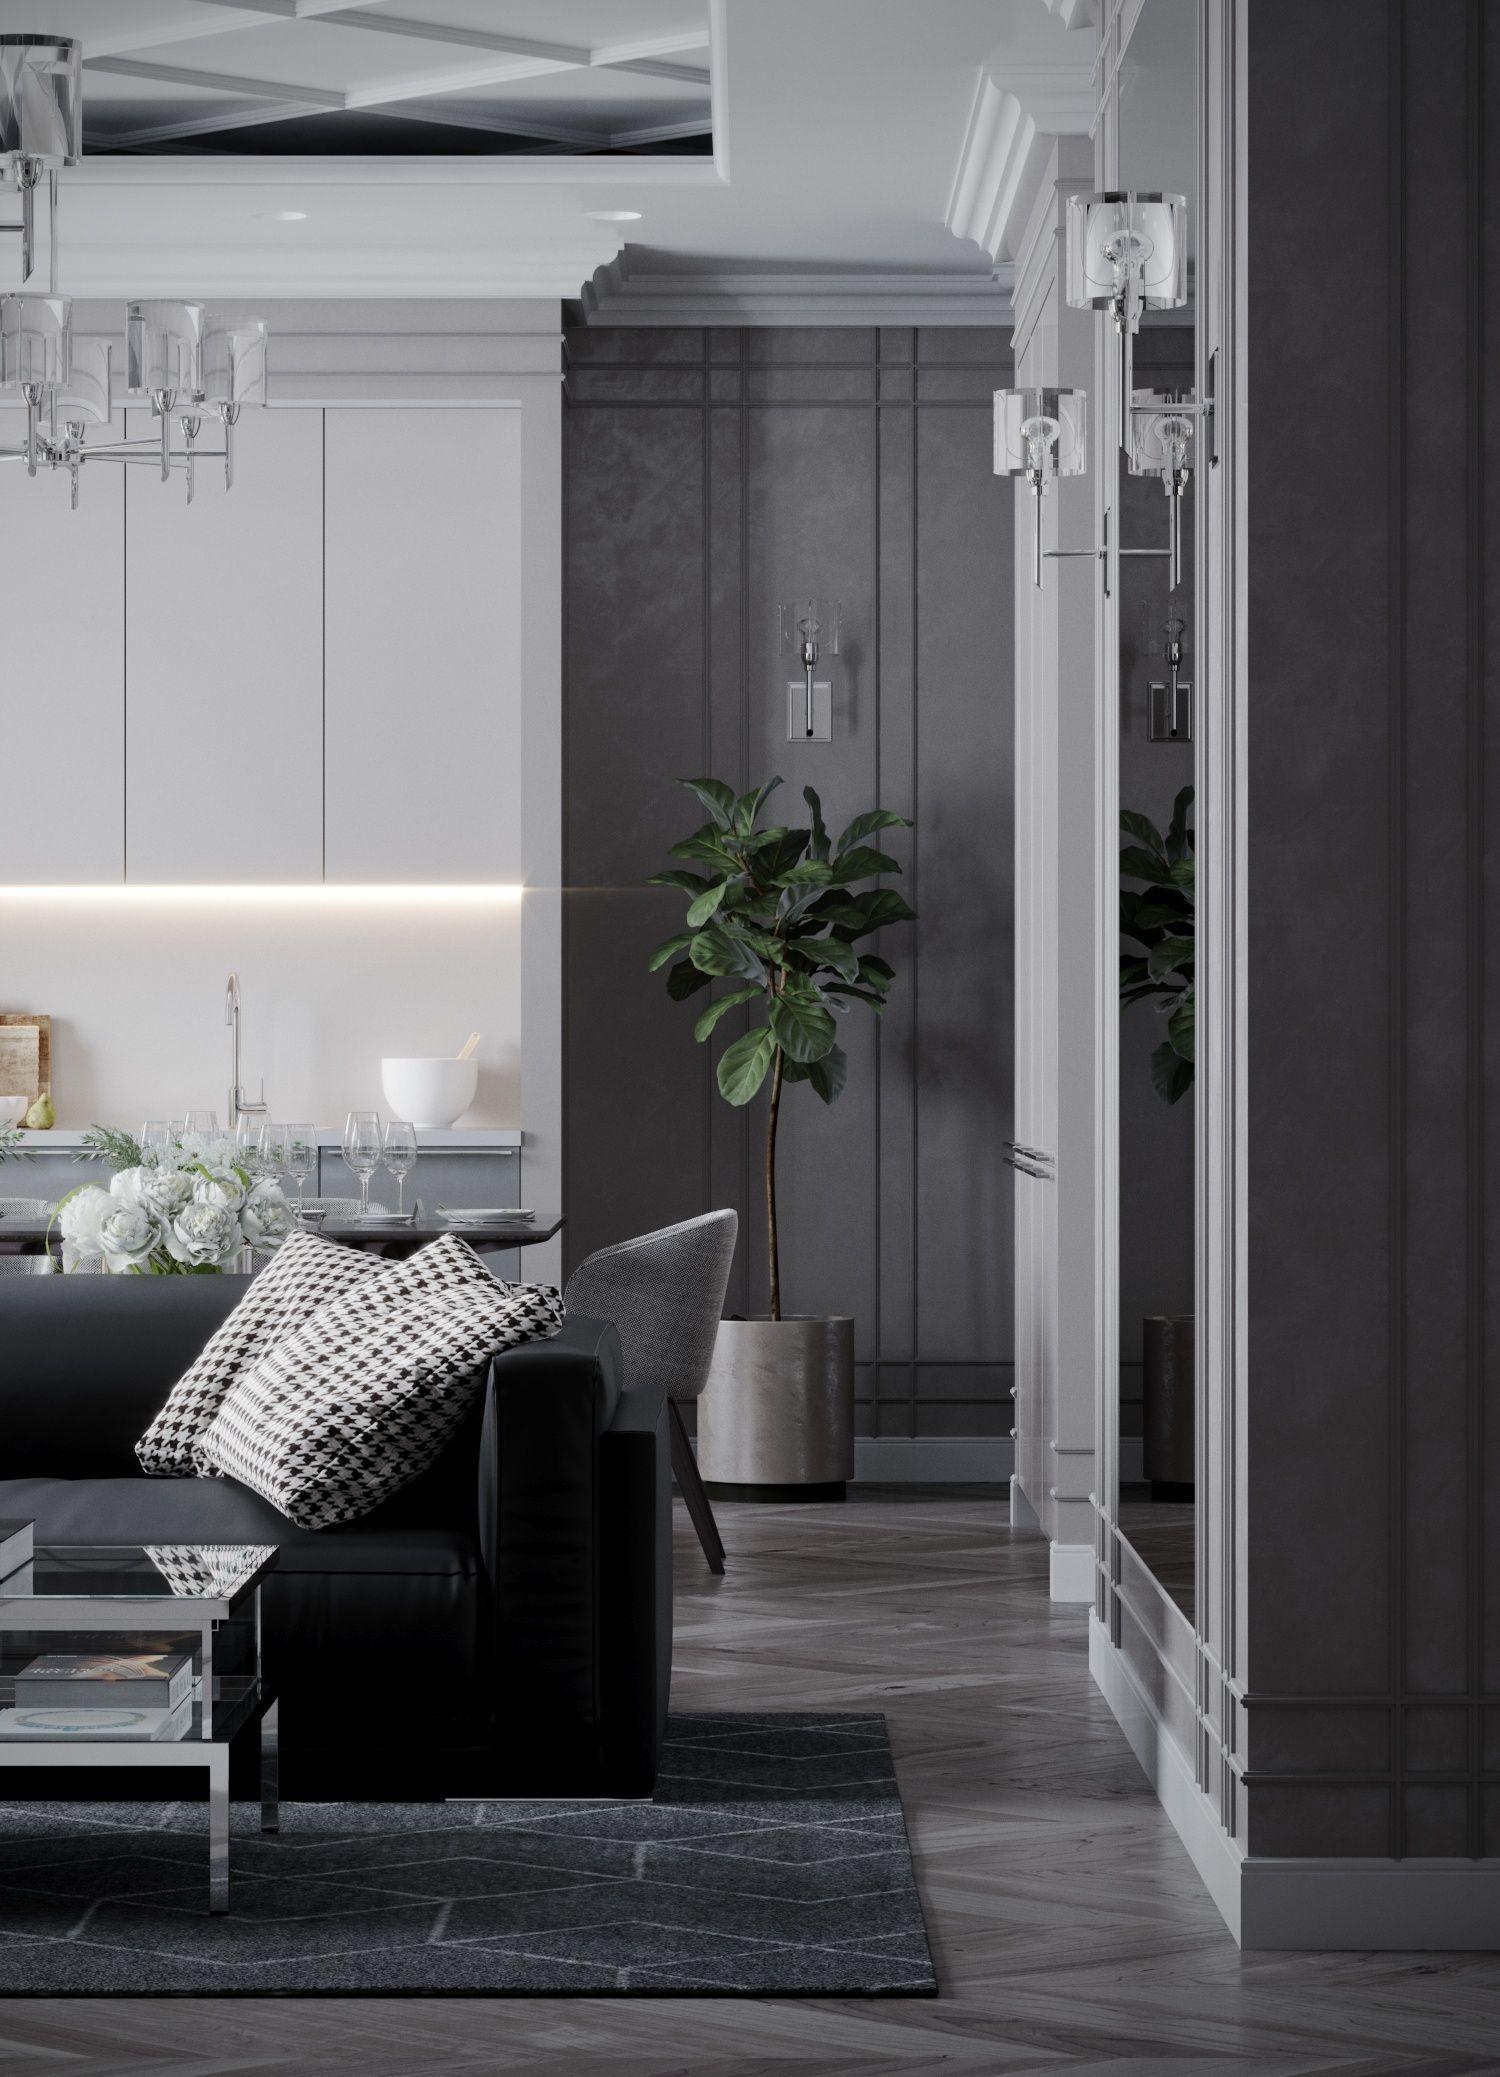 Classic american home interior living room kitchen design interior vizualization гостиная